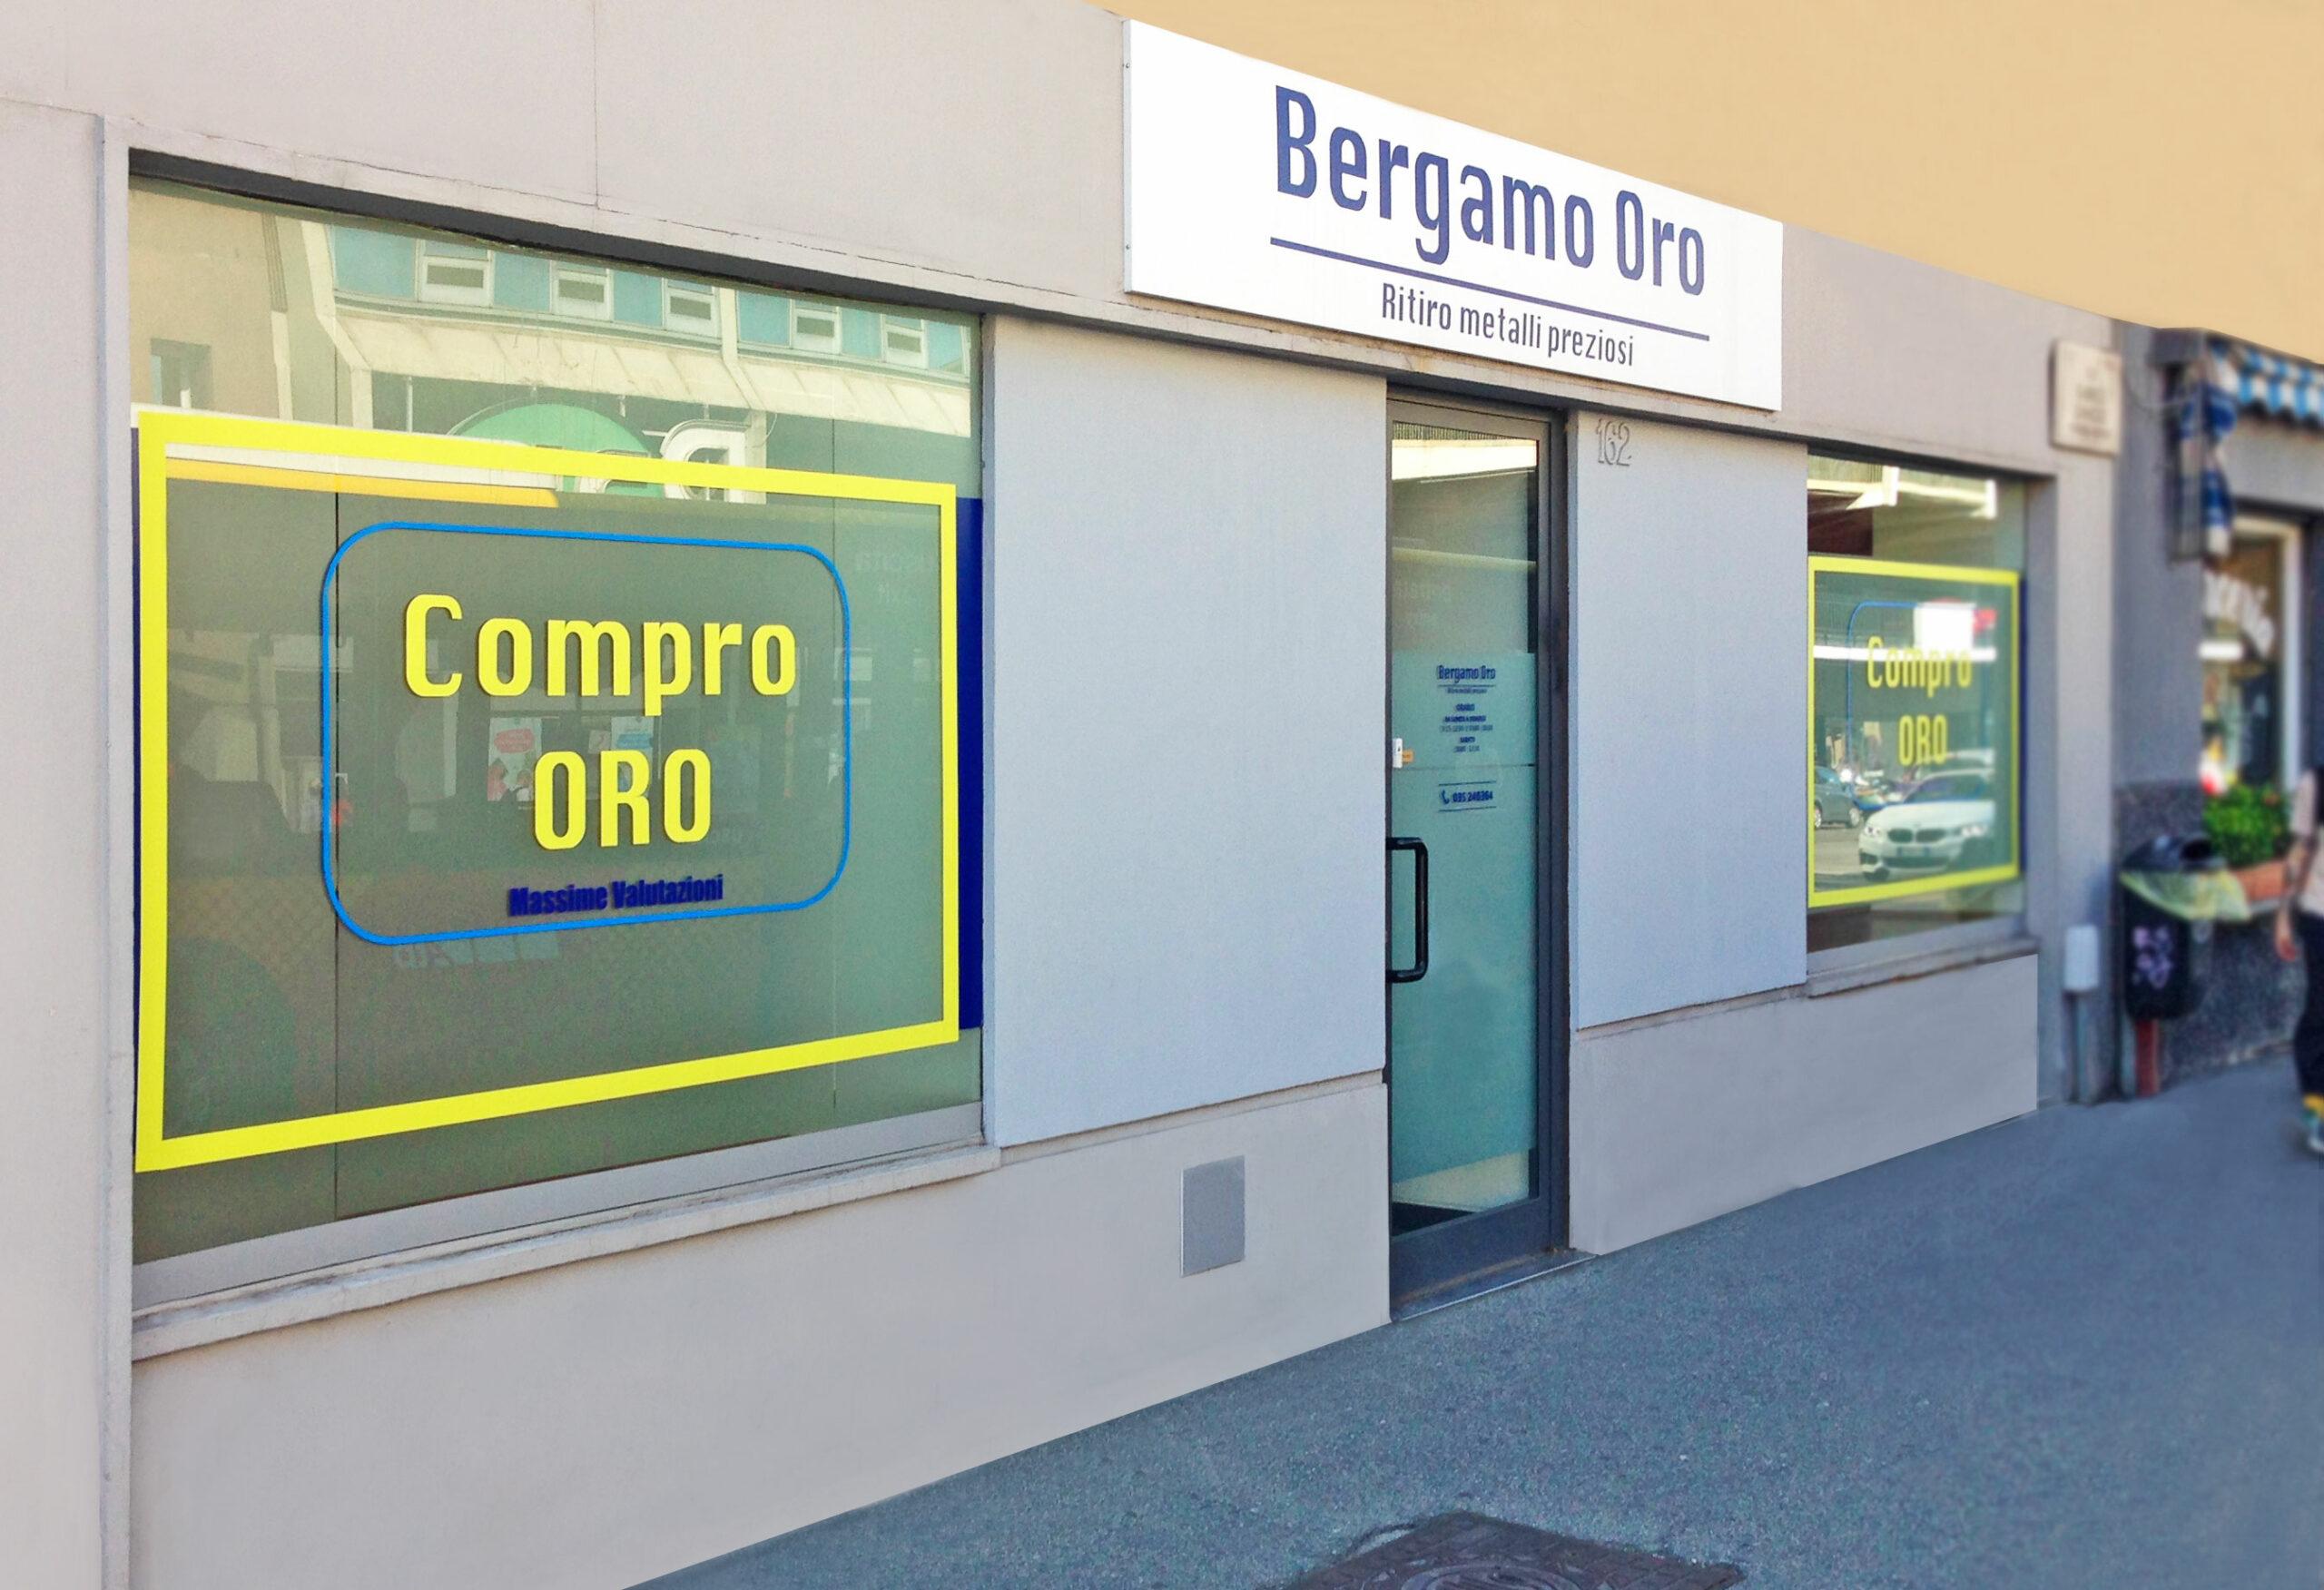 Compro Oro e Argento a Bergamo